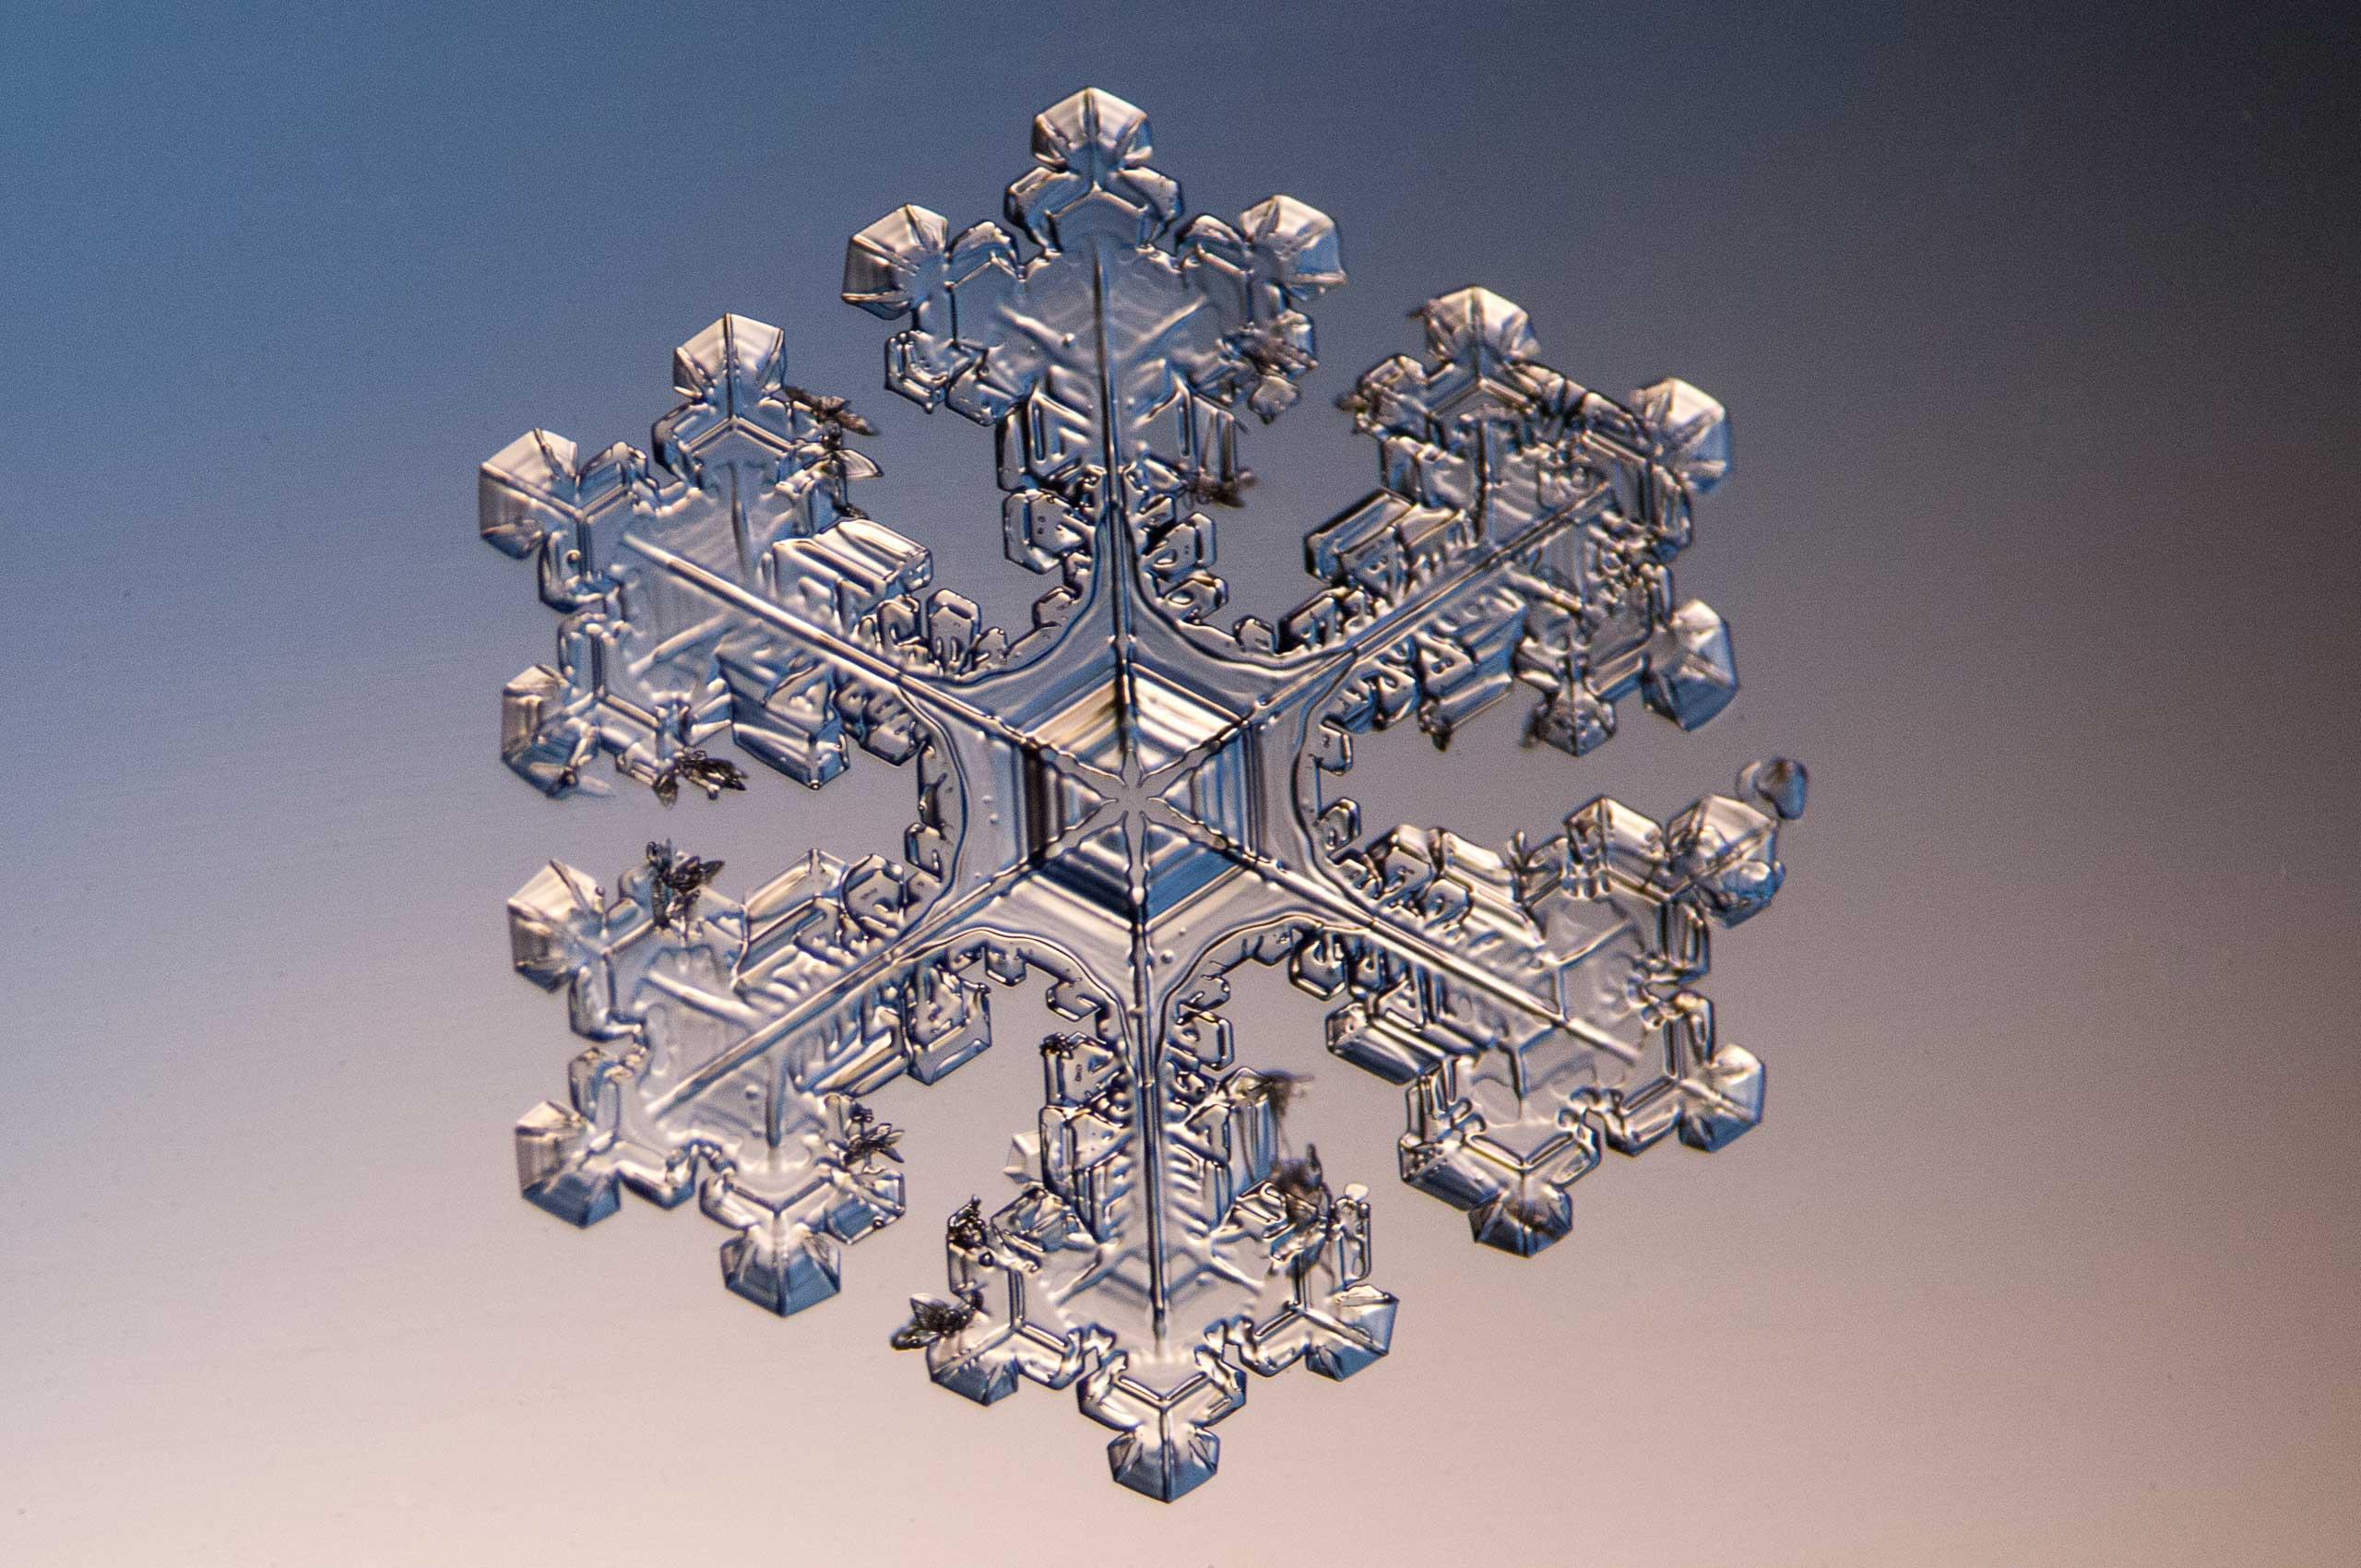 A snowflake at 8x magnification.